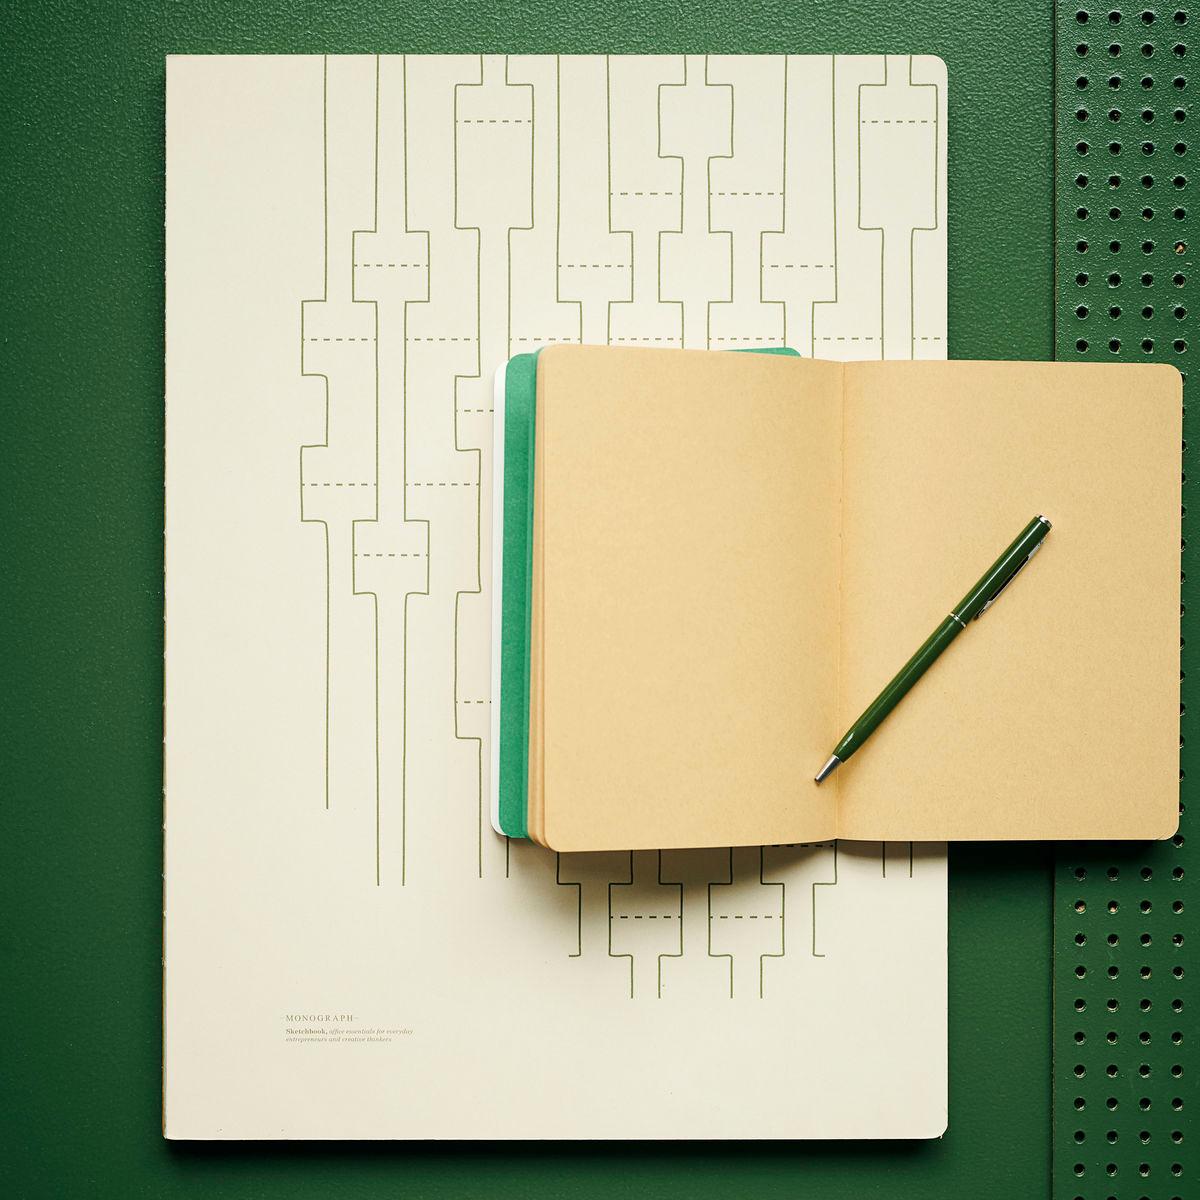 Cuaderno tamaño A3 Geometric Ecru |  Hojas lisas | Cuadernos para artistas